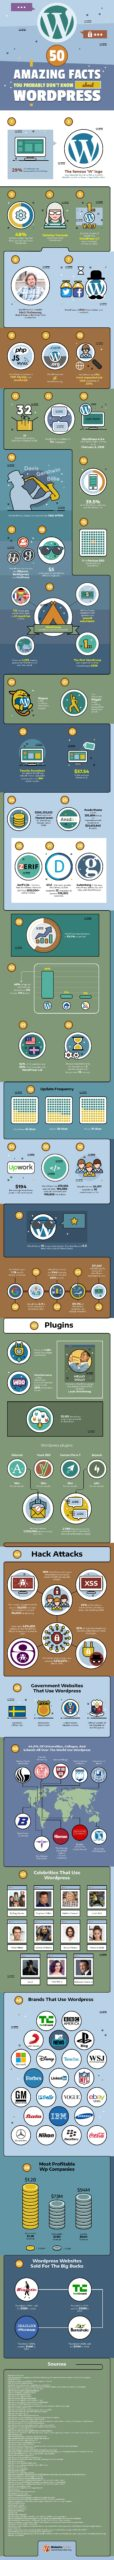 50 WordPress Facts